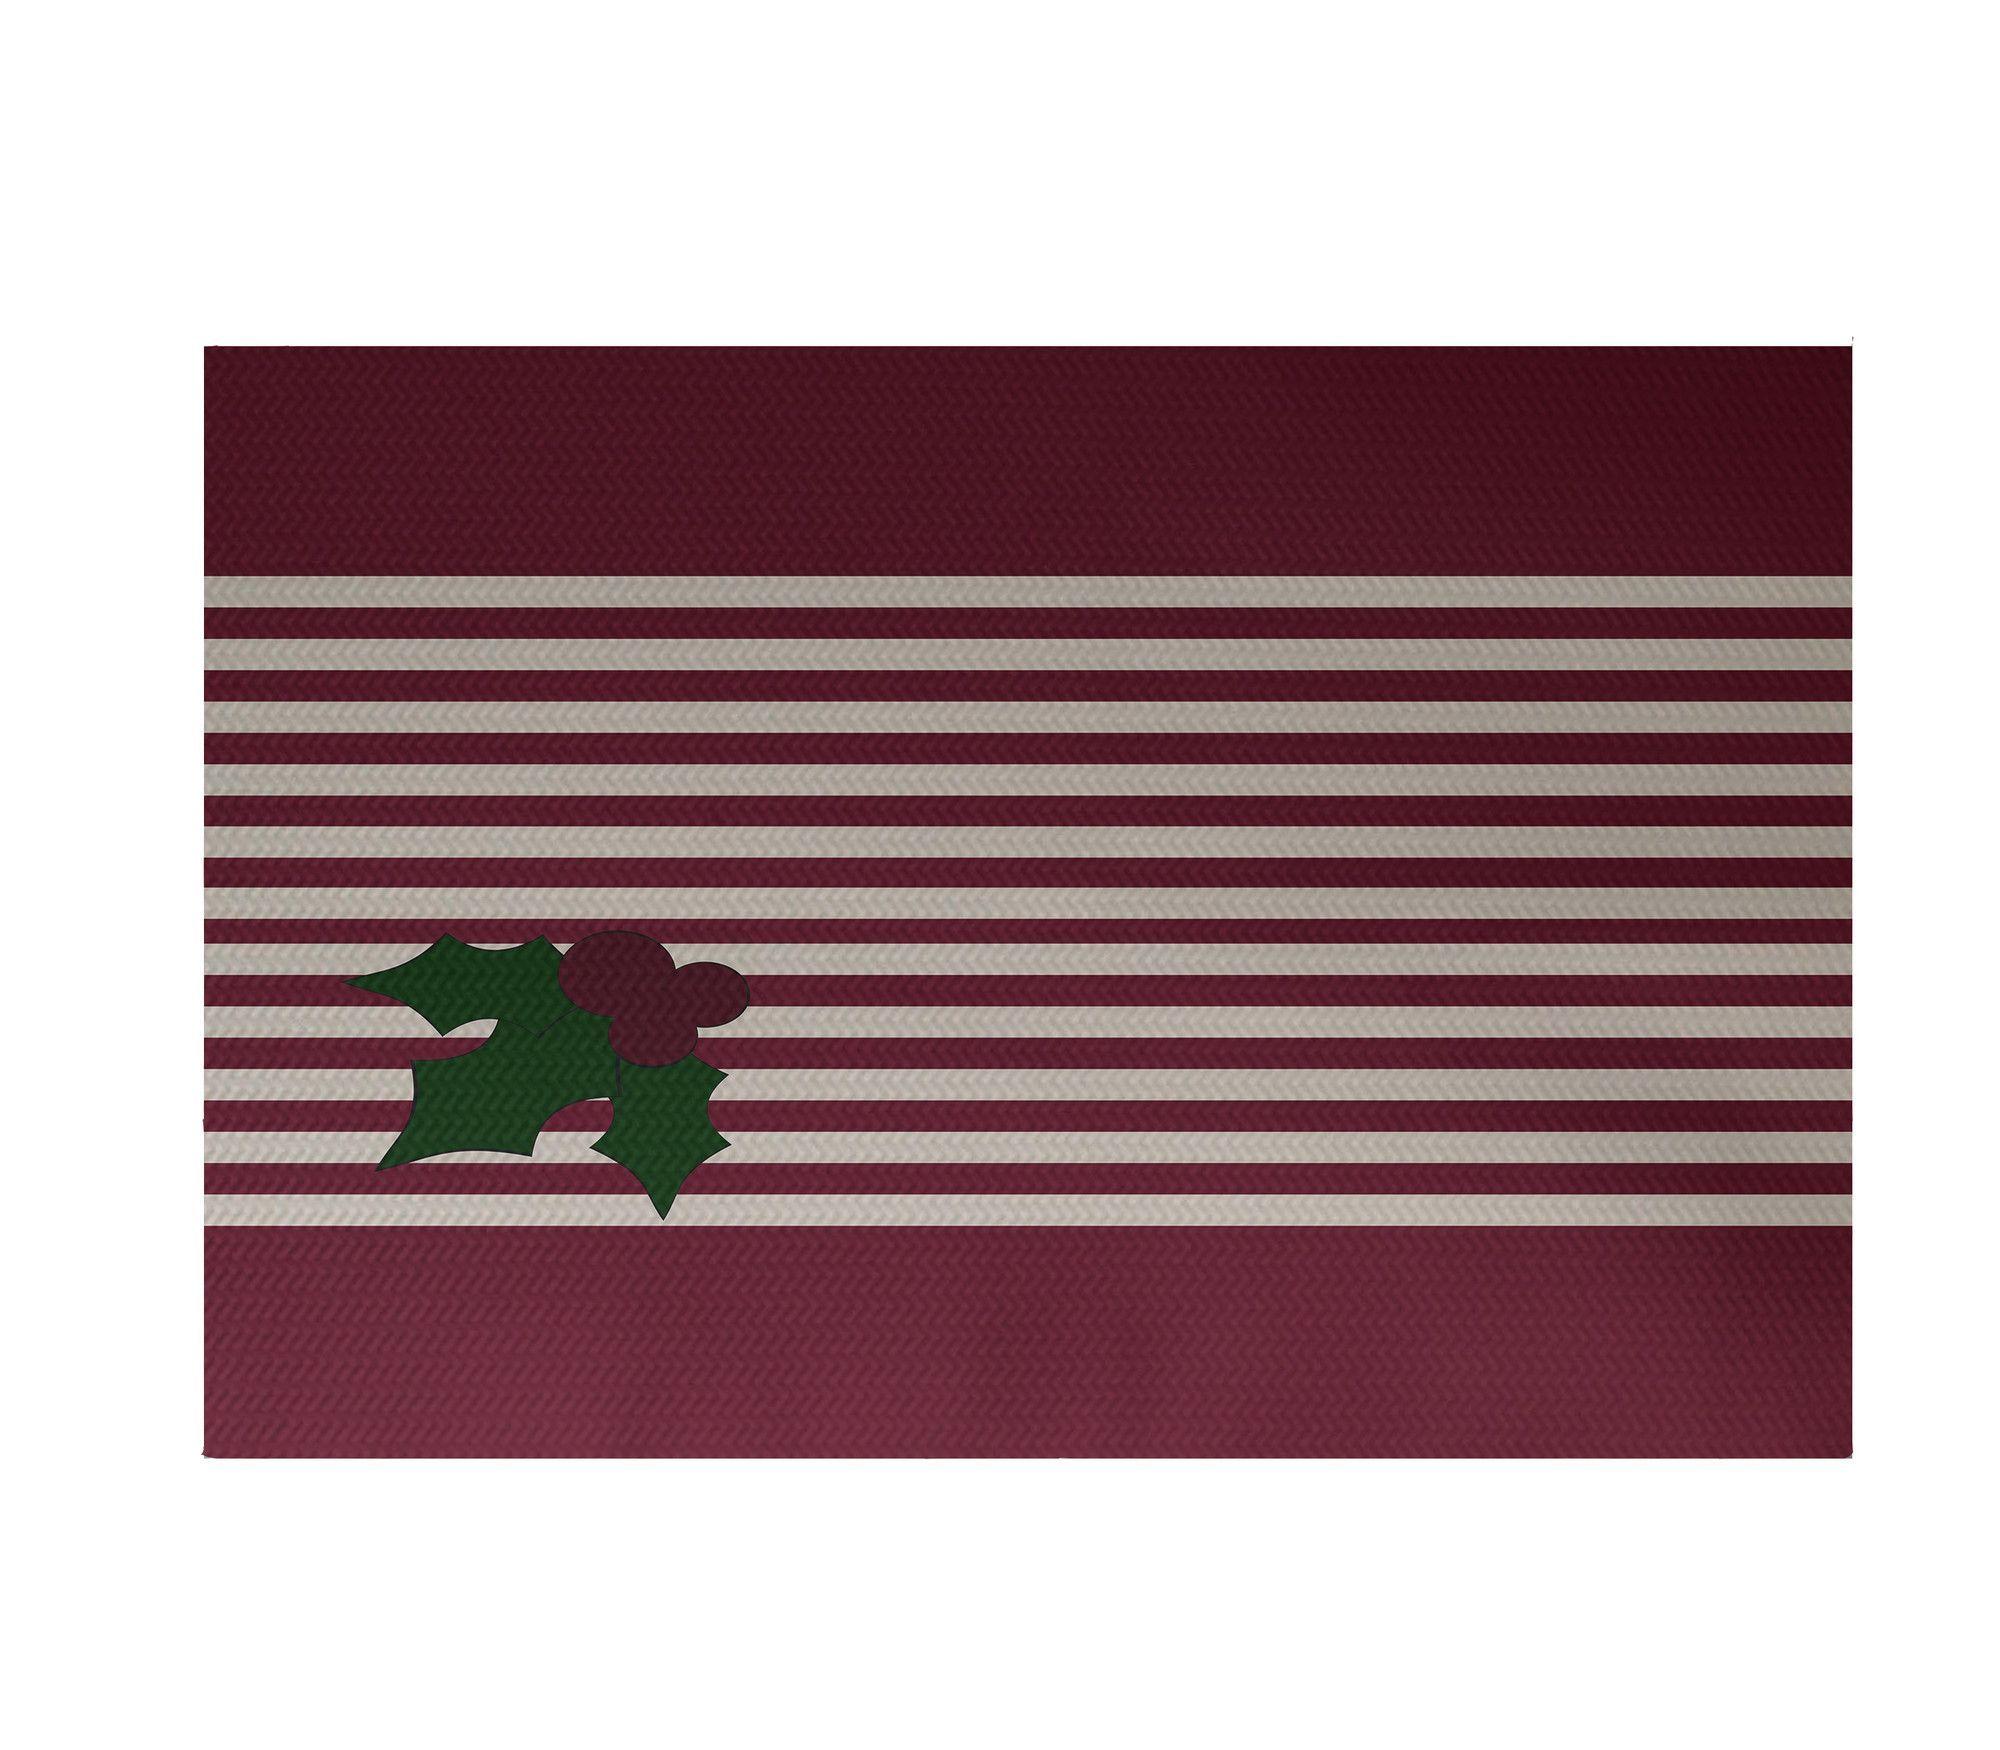 Holly Stripe Decorative Holiday Stripe Print Indoor Outdoor Rug Cranberry Burgundy Indoor Outdoor Area Rug Products Indoor Outdoor Rugs Outdoor Rugs Indo